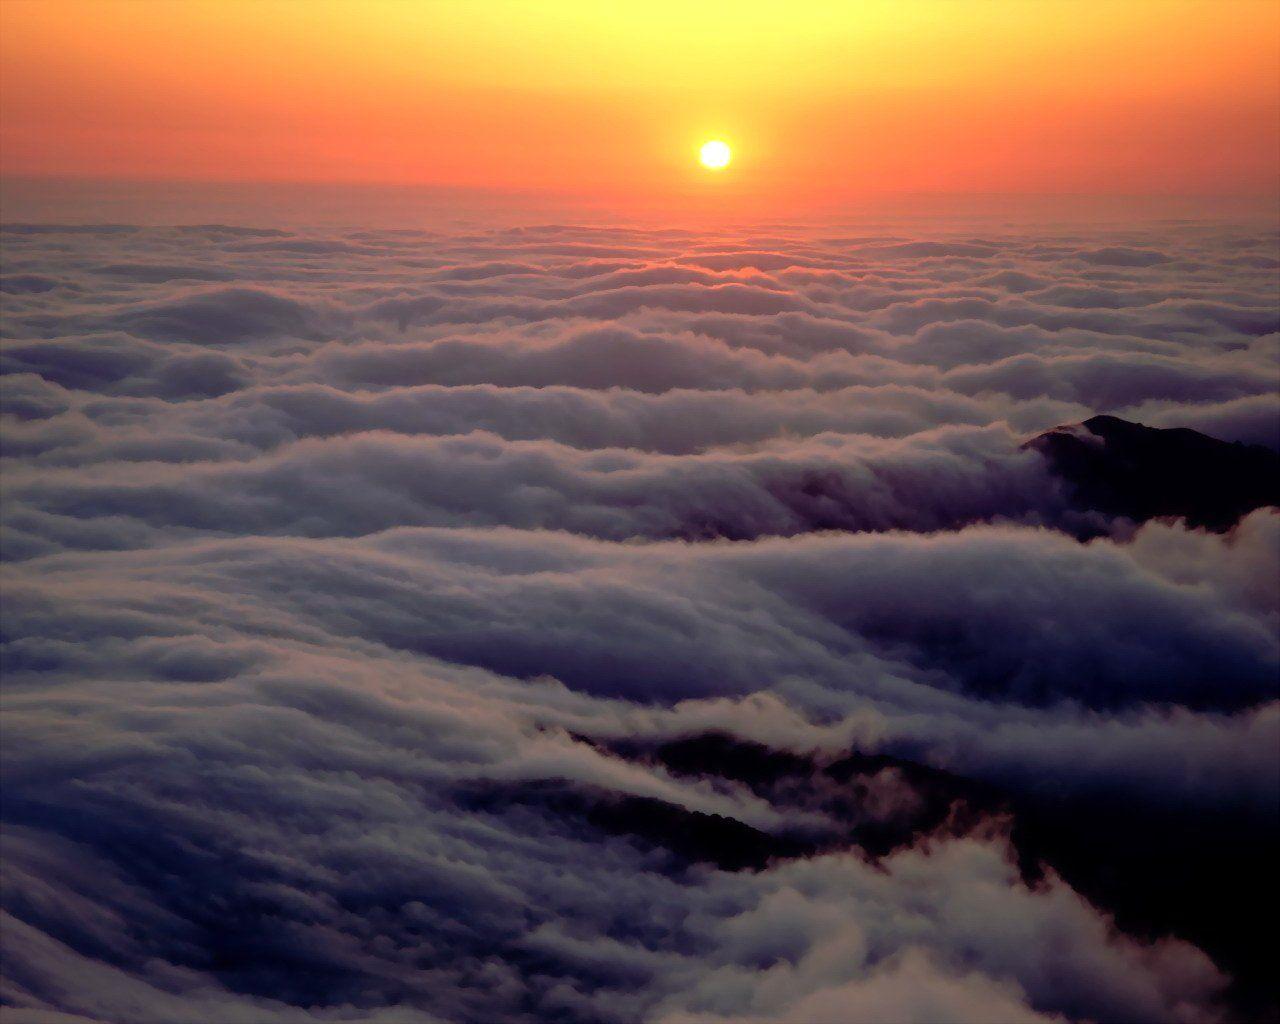 ocean nature sunset oceans clouds sea above atom subscribe posts sunsets pi desktop